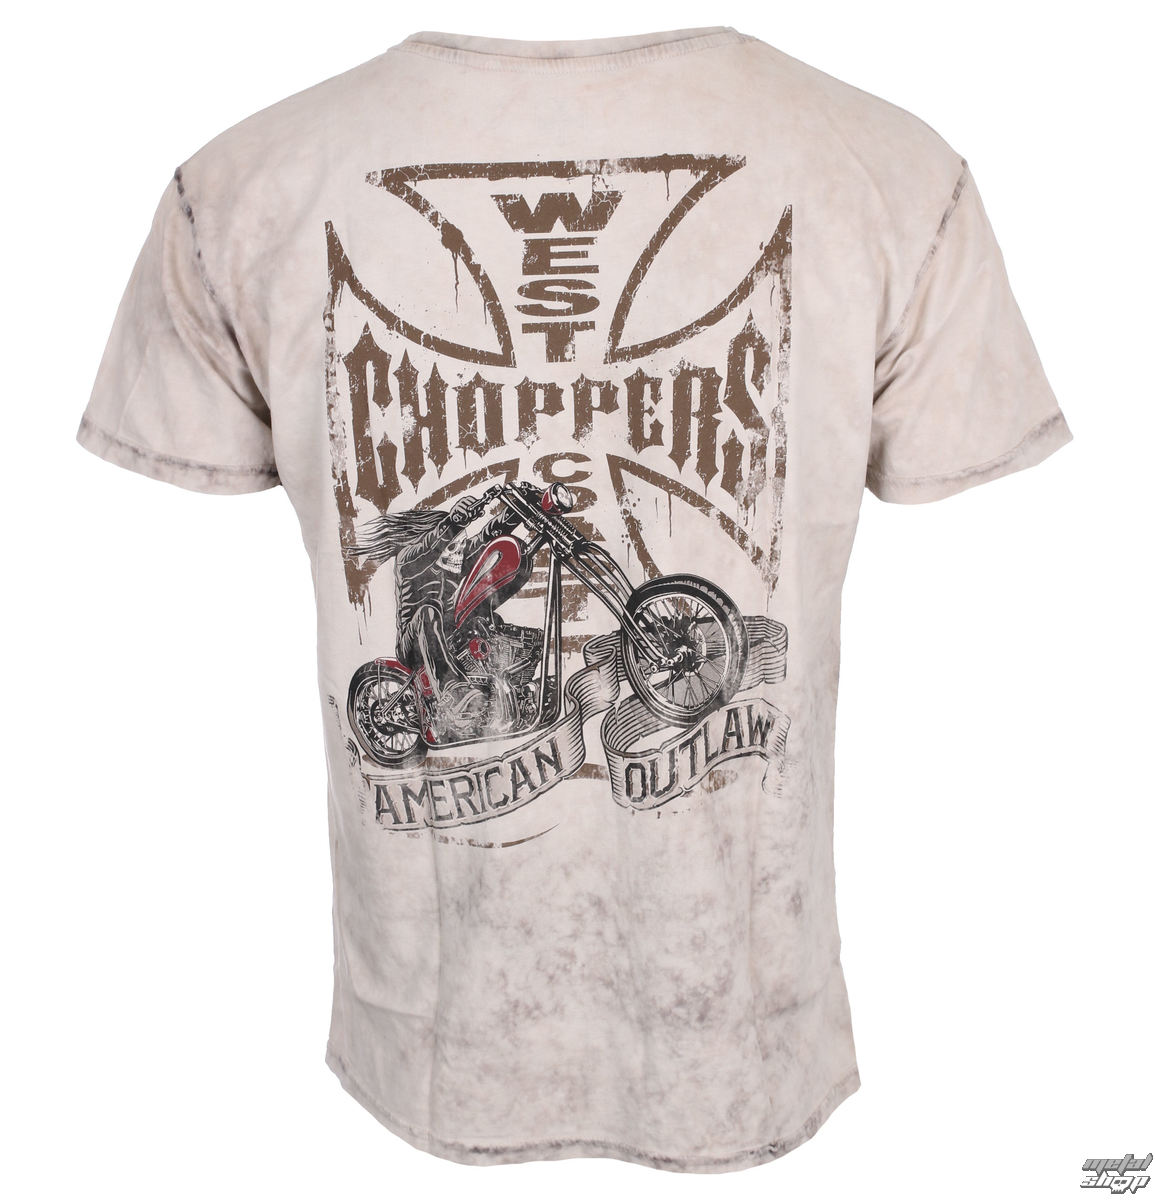 WEST COAST CHOPPERS T-Shirt Chopper Dog T-Shirts